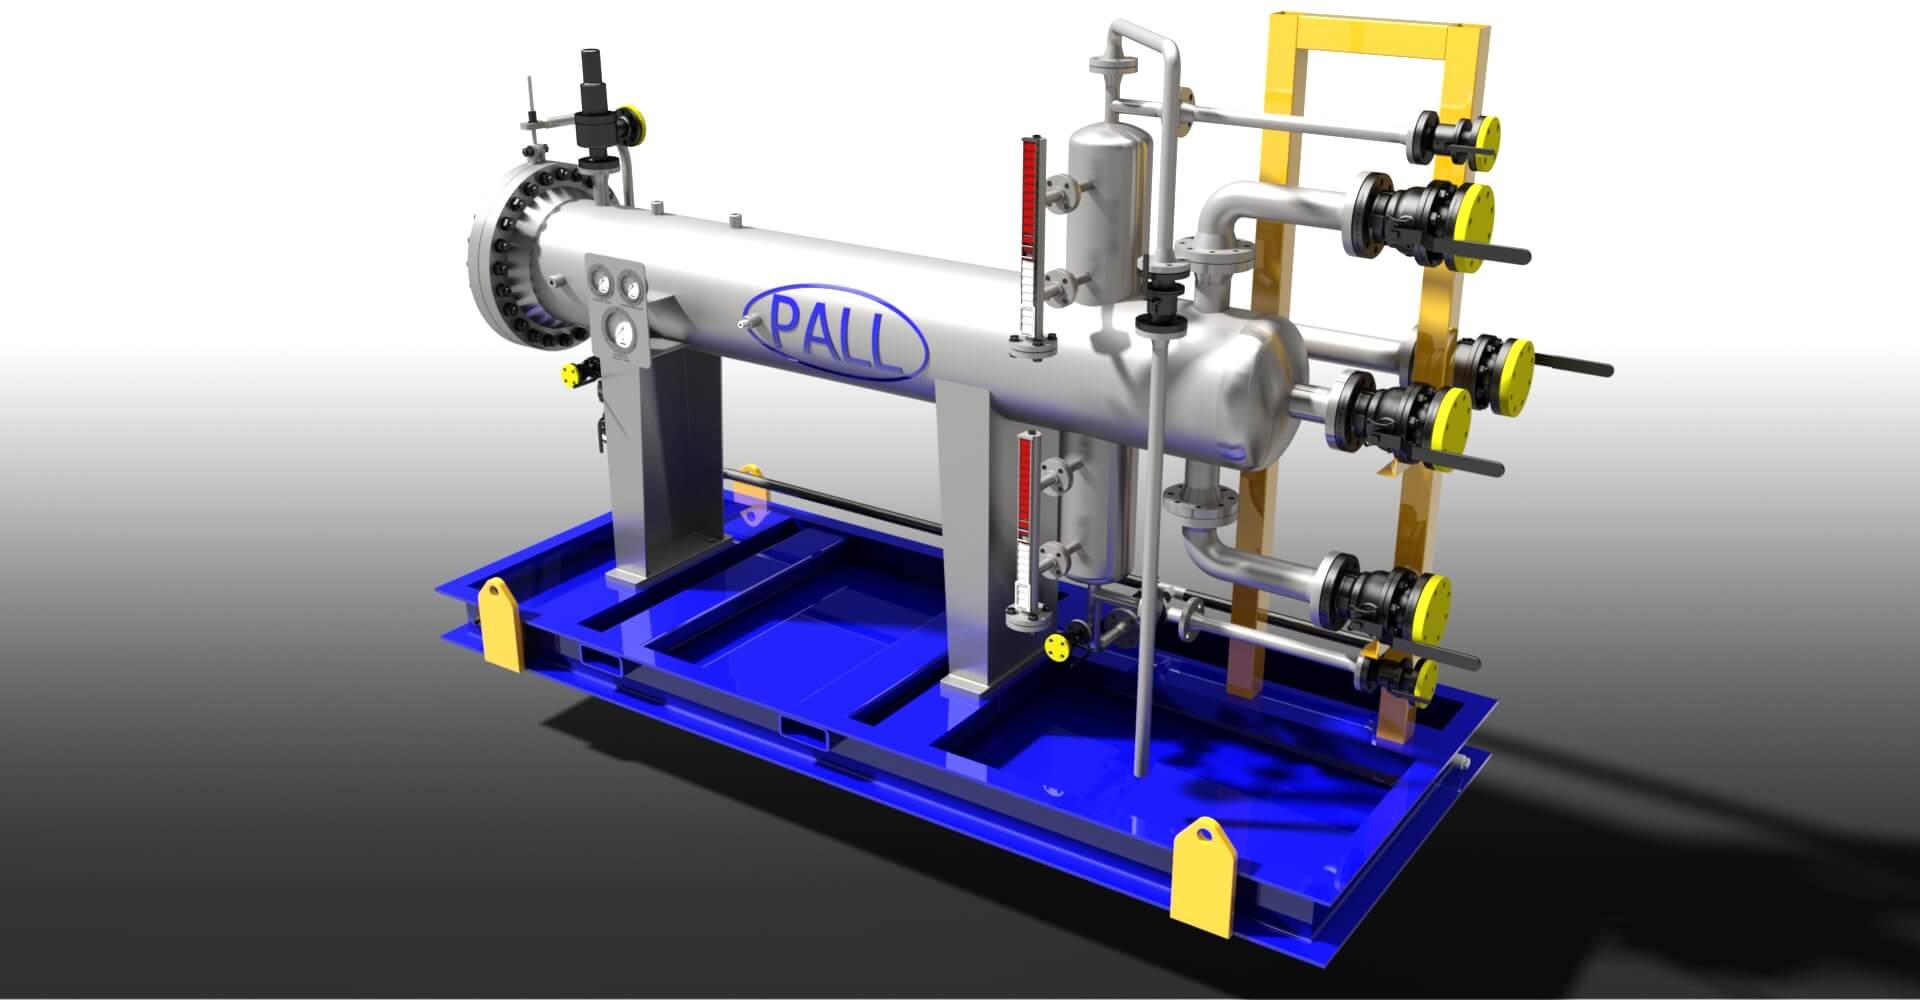 Pro Services Filter/Coalescer Rental Fleet | Pall Corporation